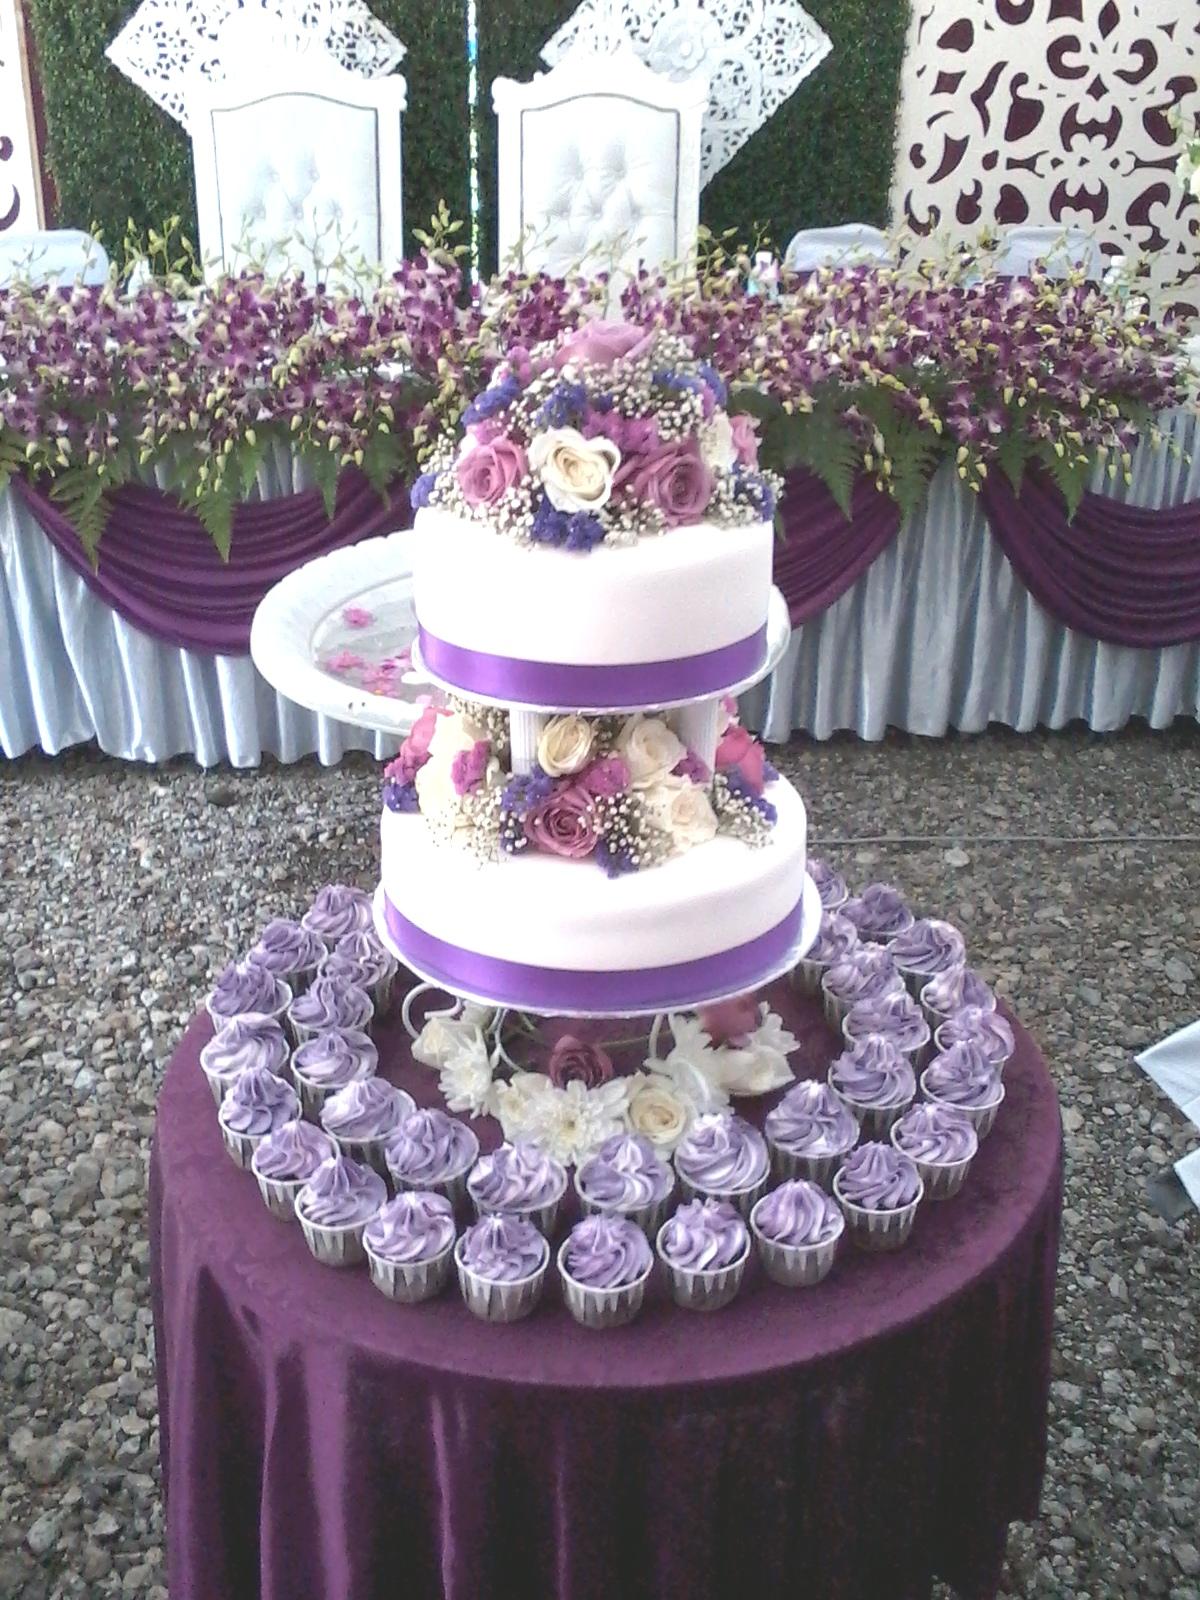 10 Wedding Cakes Purple Theme Cupcakes Photo Purple And Silver